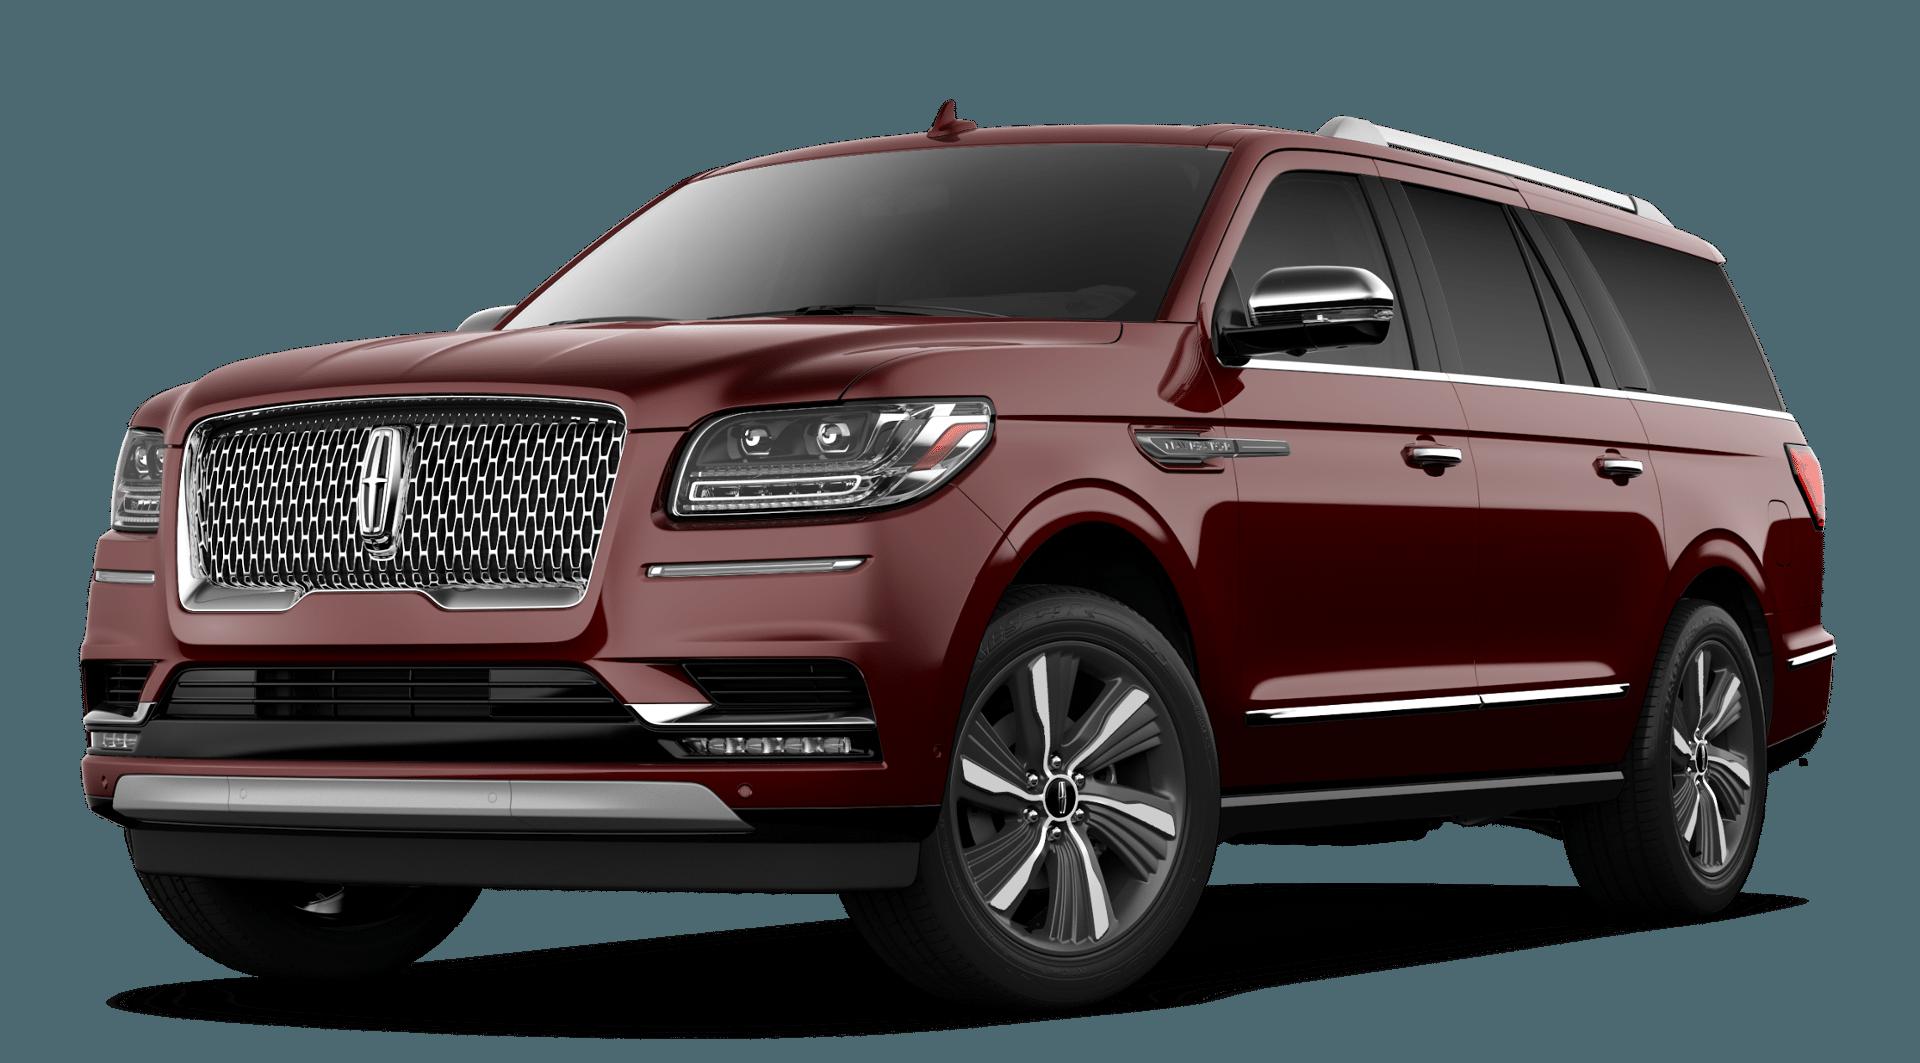 2019 Lincoln Navigator Build Price Lincoln Navigator New